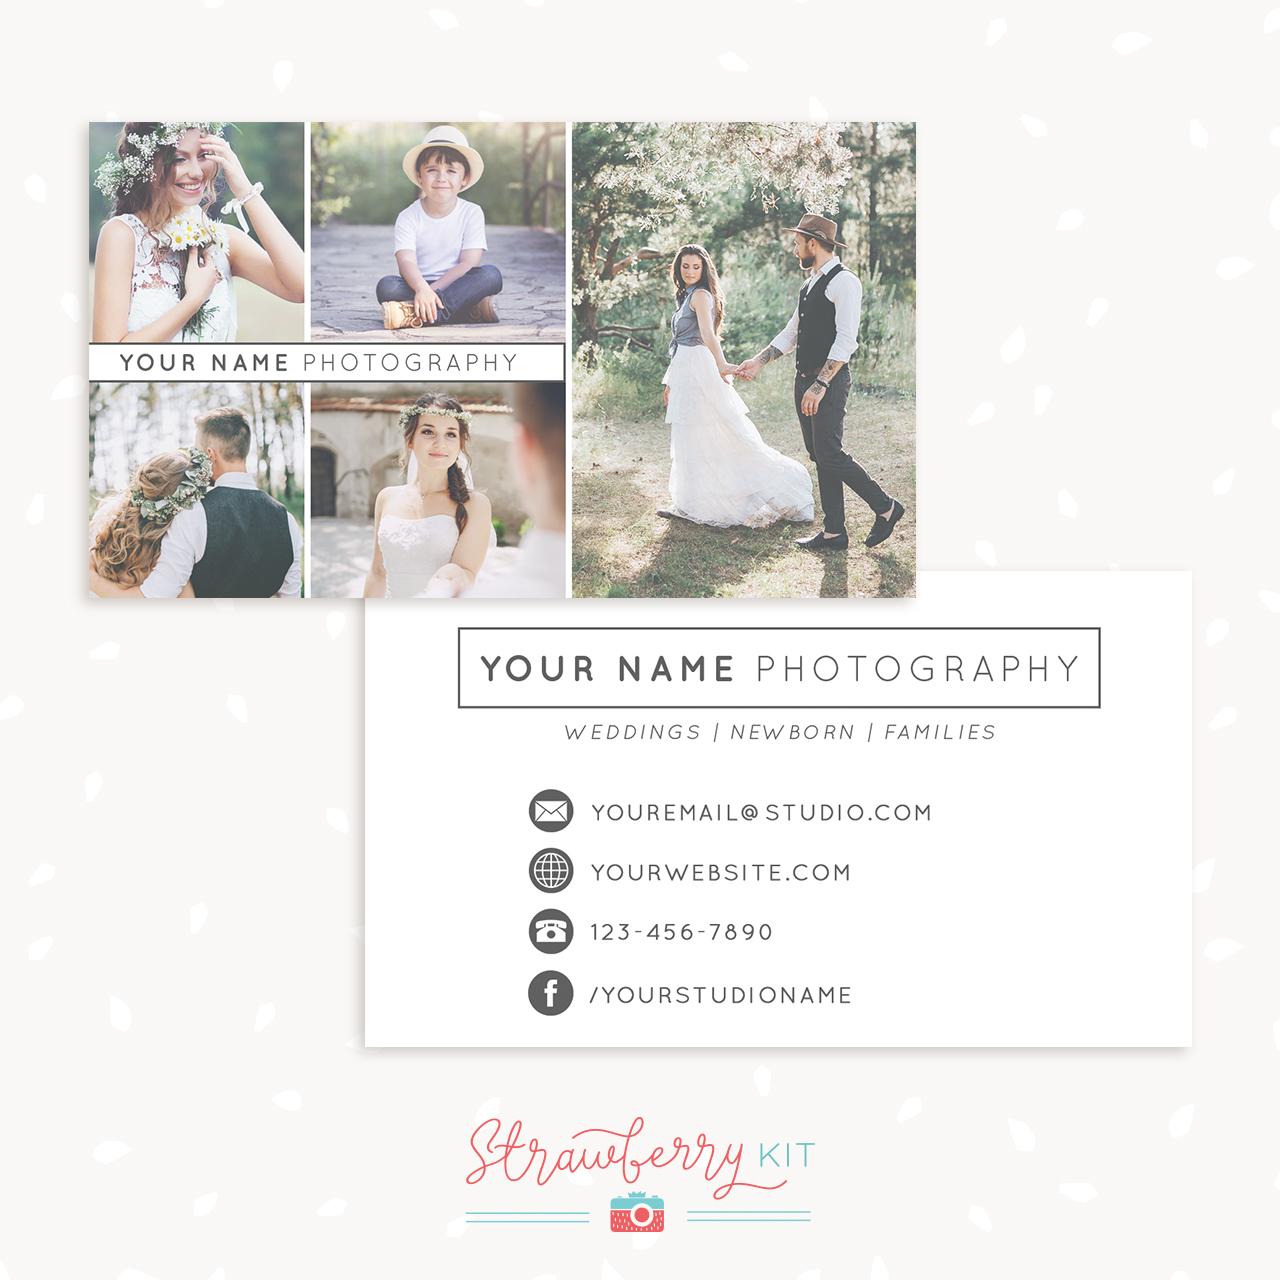 Minimalist Photography Business Card Template - Strawberry Kit